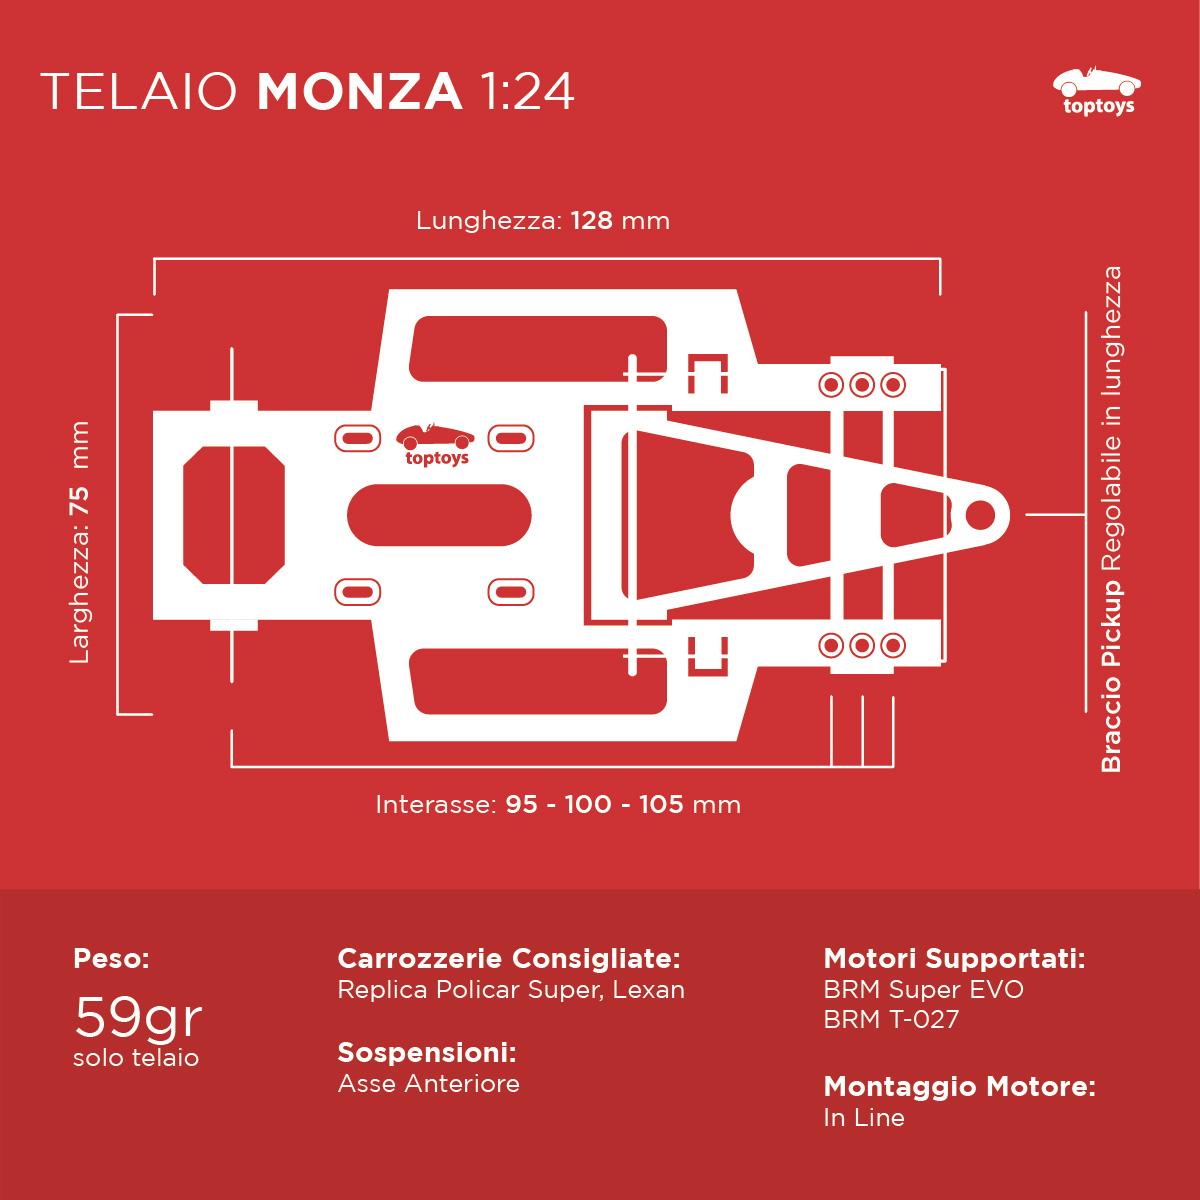 https://www.orlandinifrancesco.com/wp/wp-content/uploads/2019/06/Scheda-Tecnica-Telaio-Monza.jpg